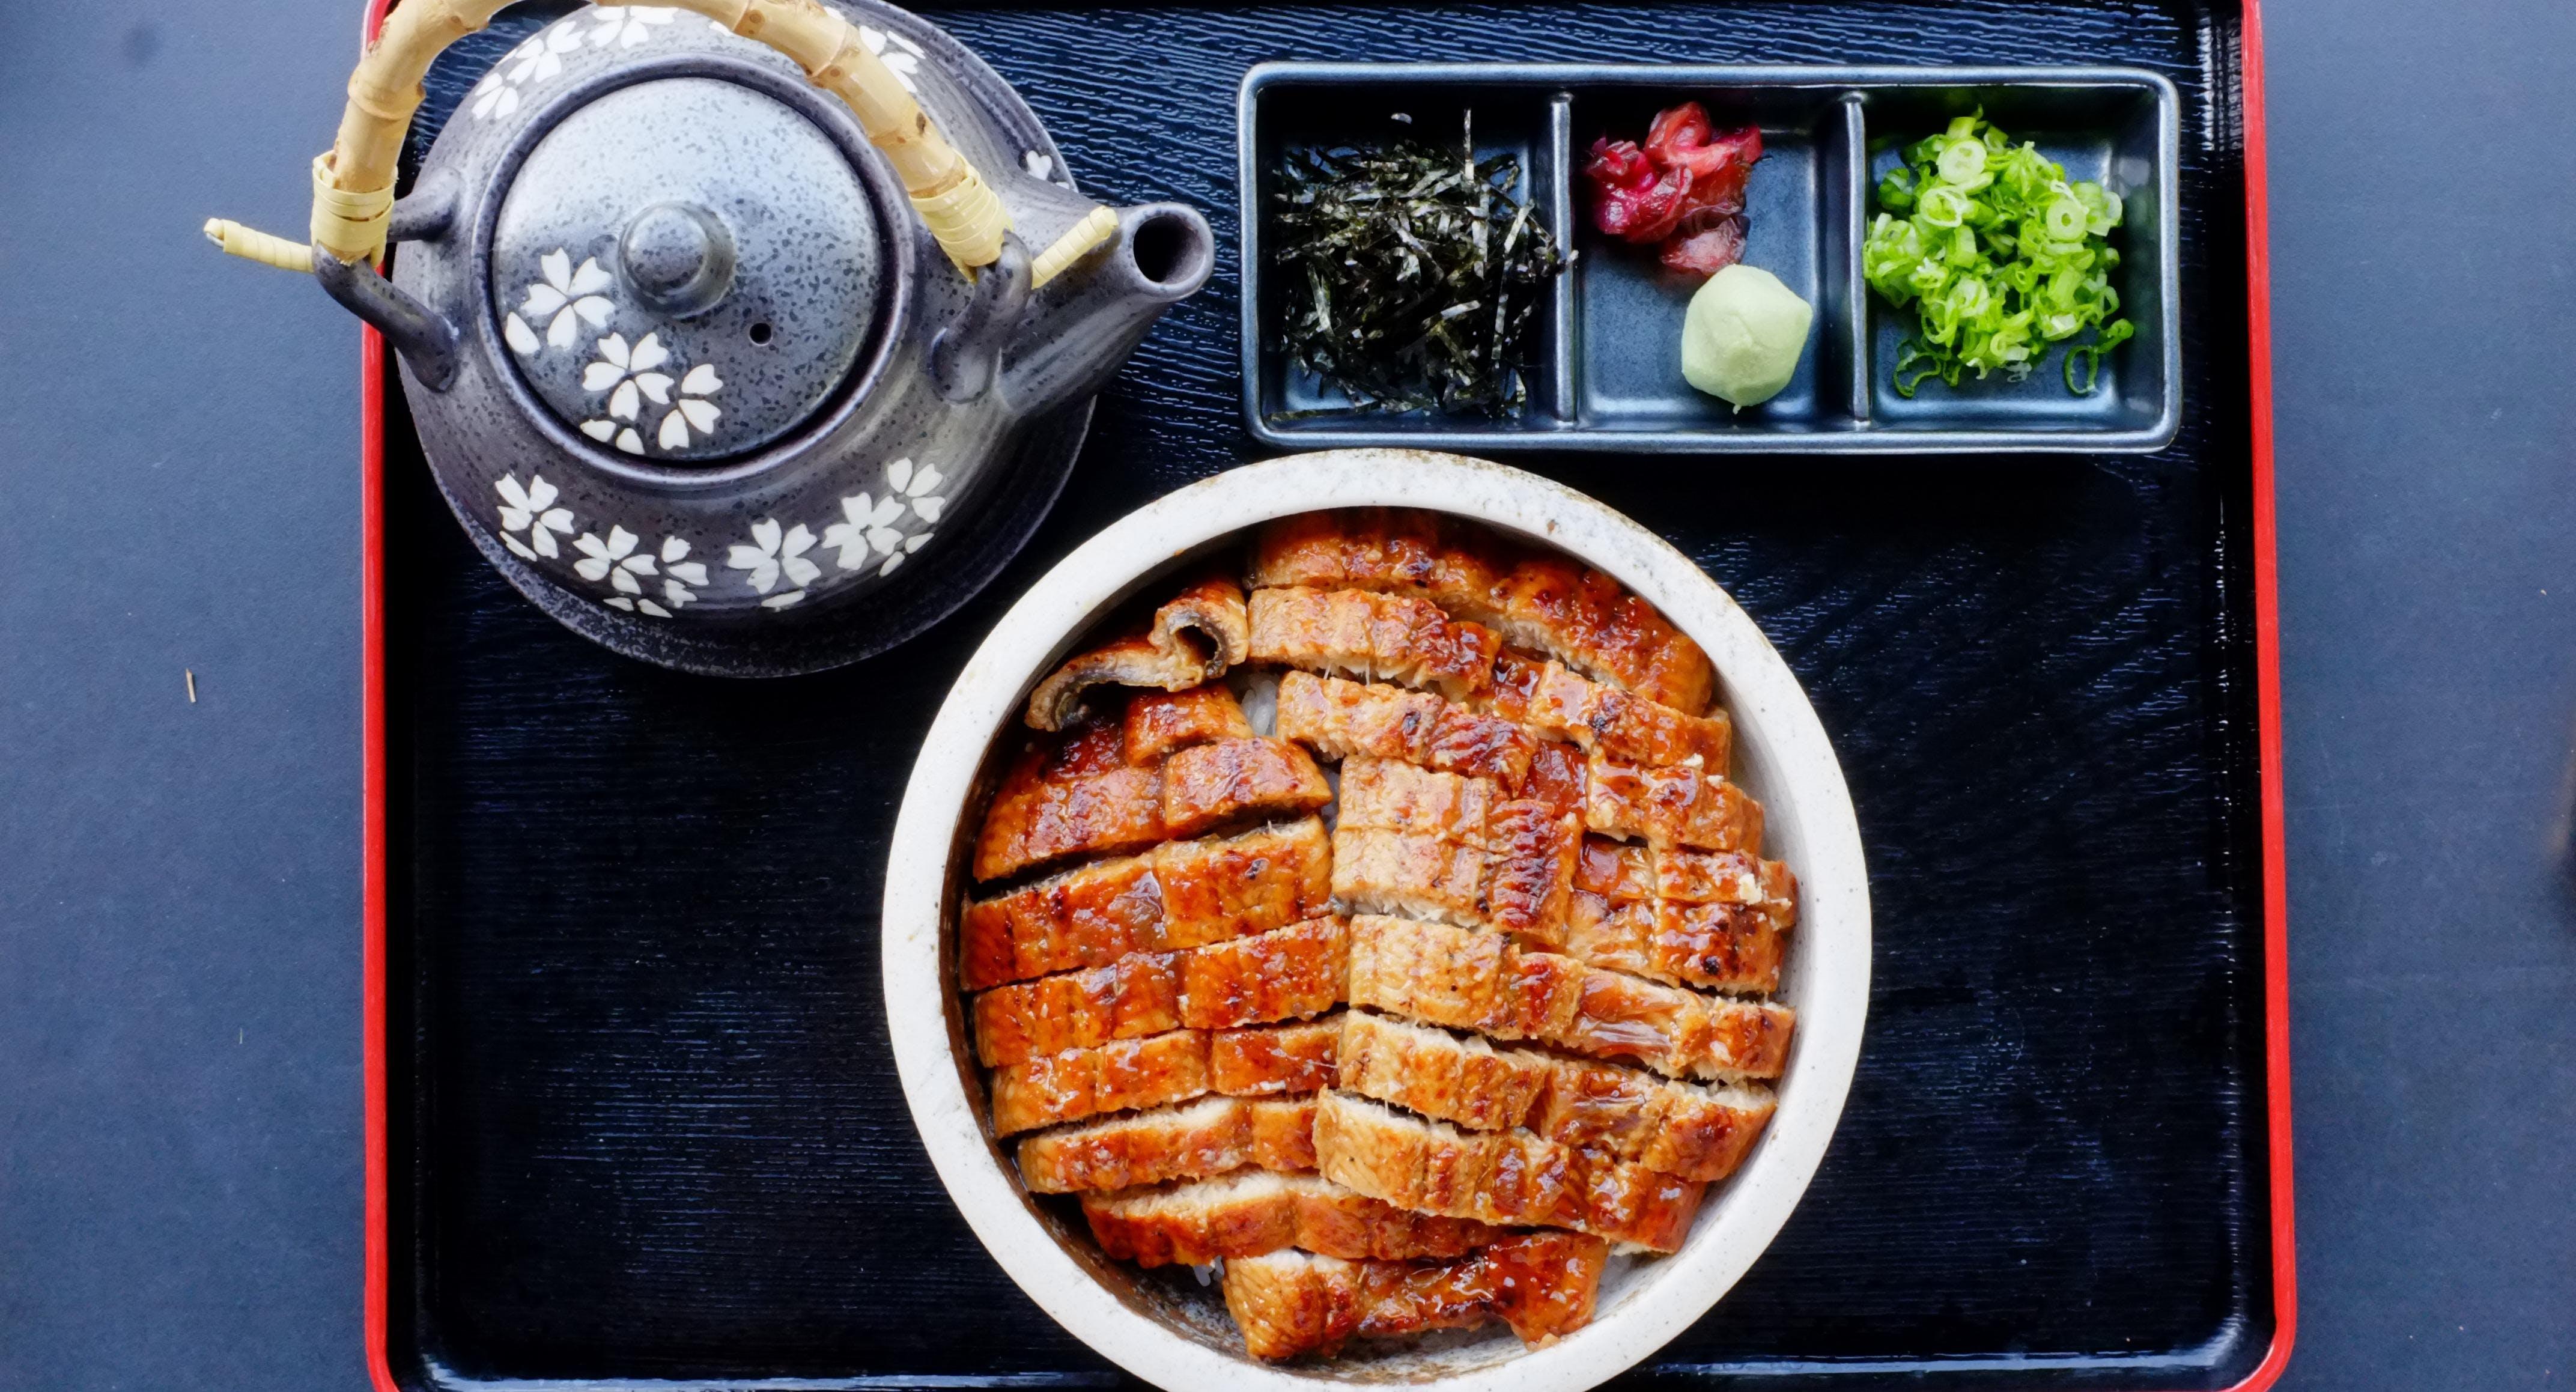 Tsukiji Fish Market Restaurant Singapore image 3